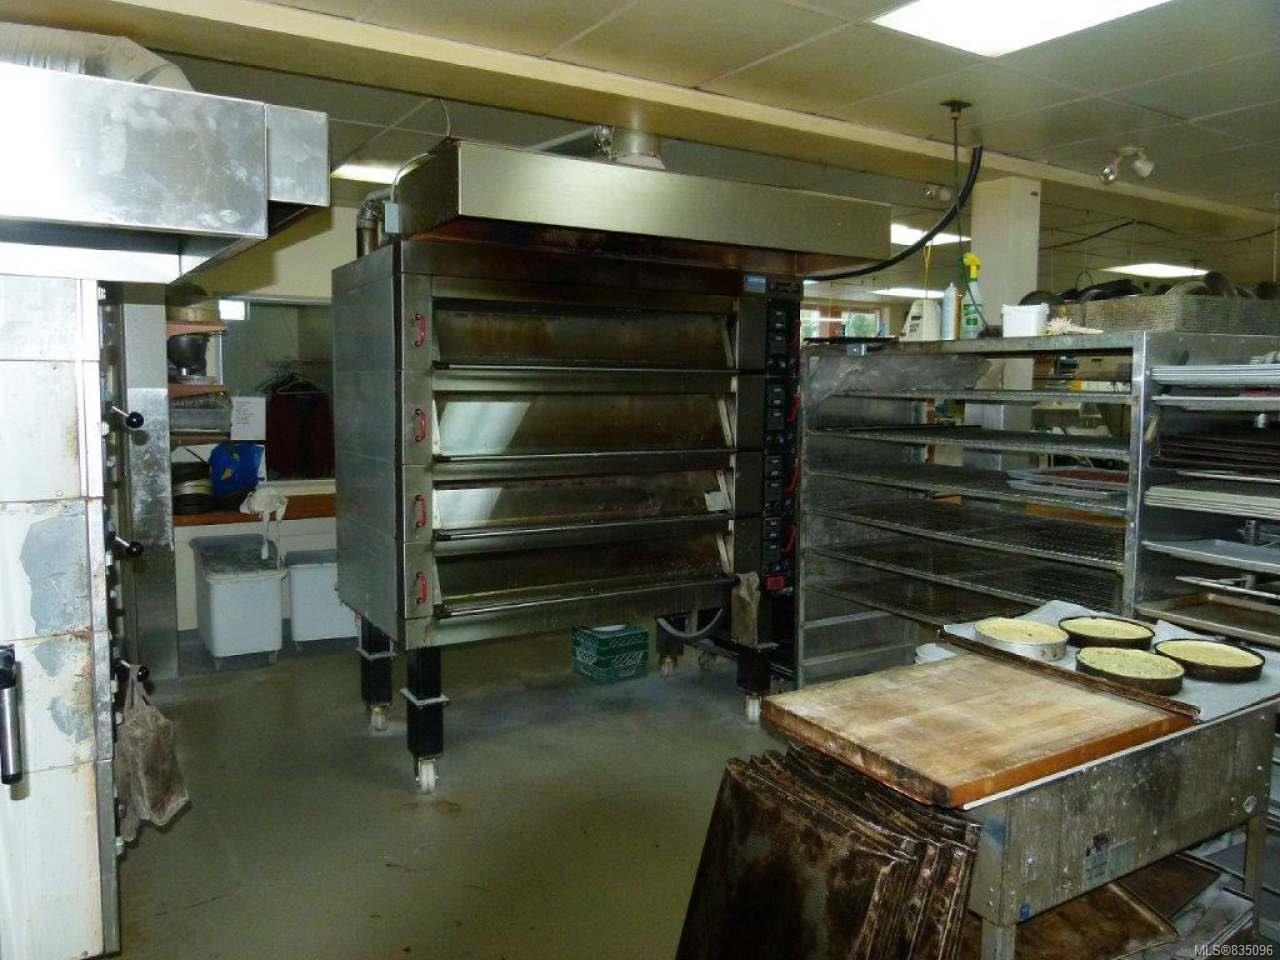 Photo 27: Photos: 2025 Bowen Rd in NANAIMO: Na Central Nanaimo Mixed Use for sale (Nanaimo)  : MLS®# 835096